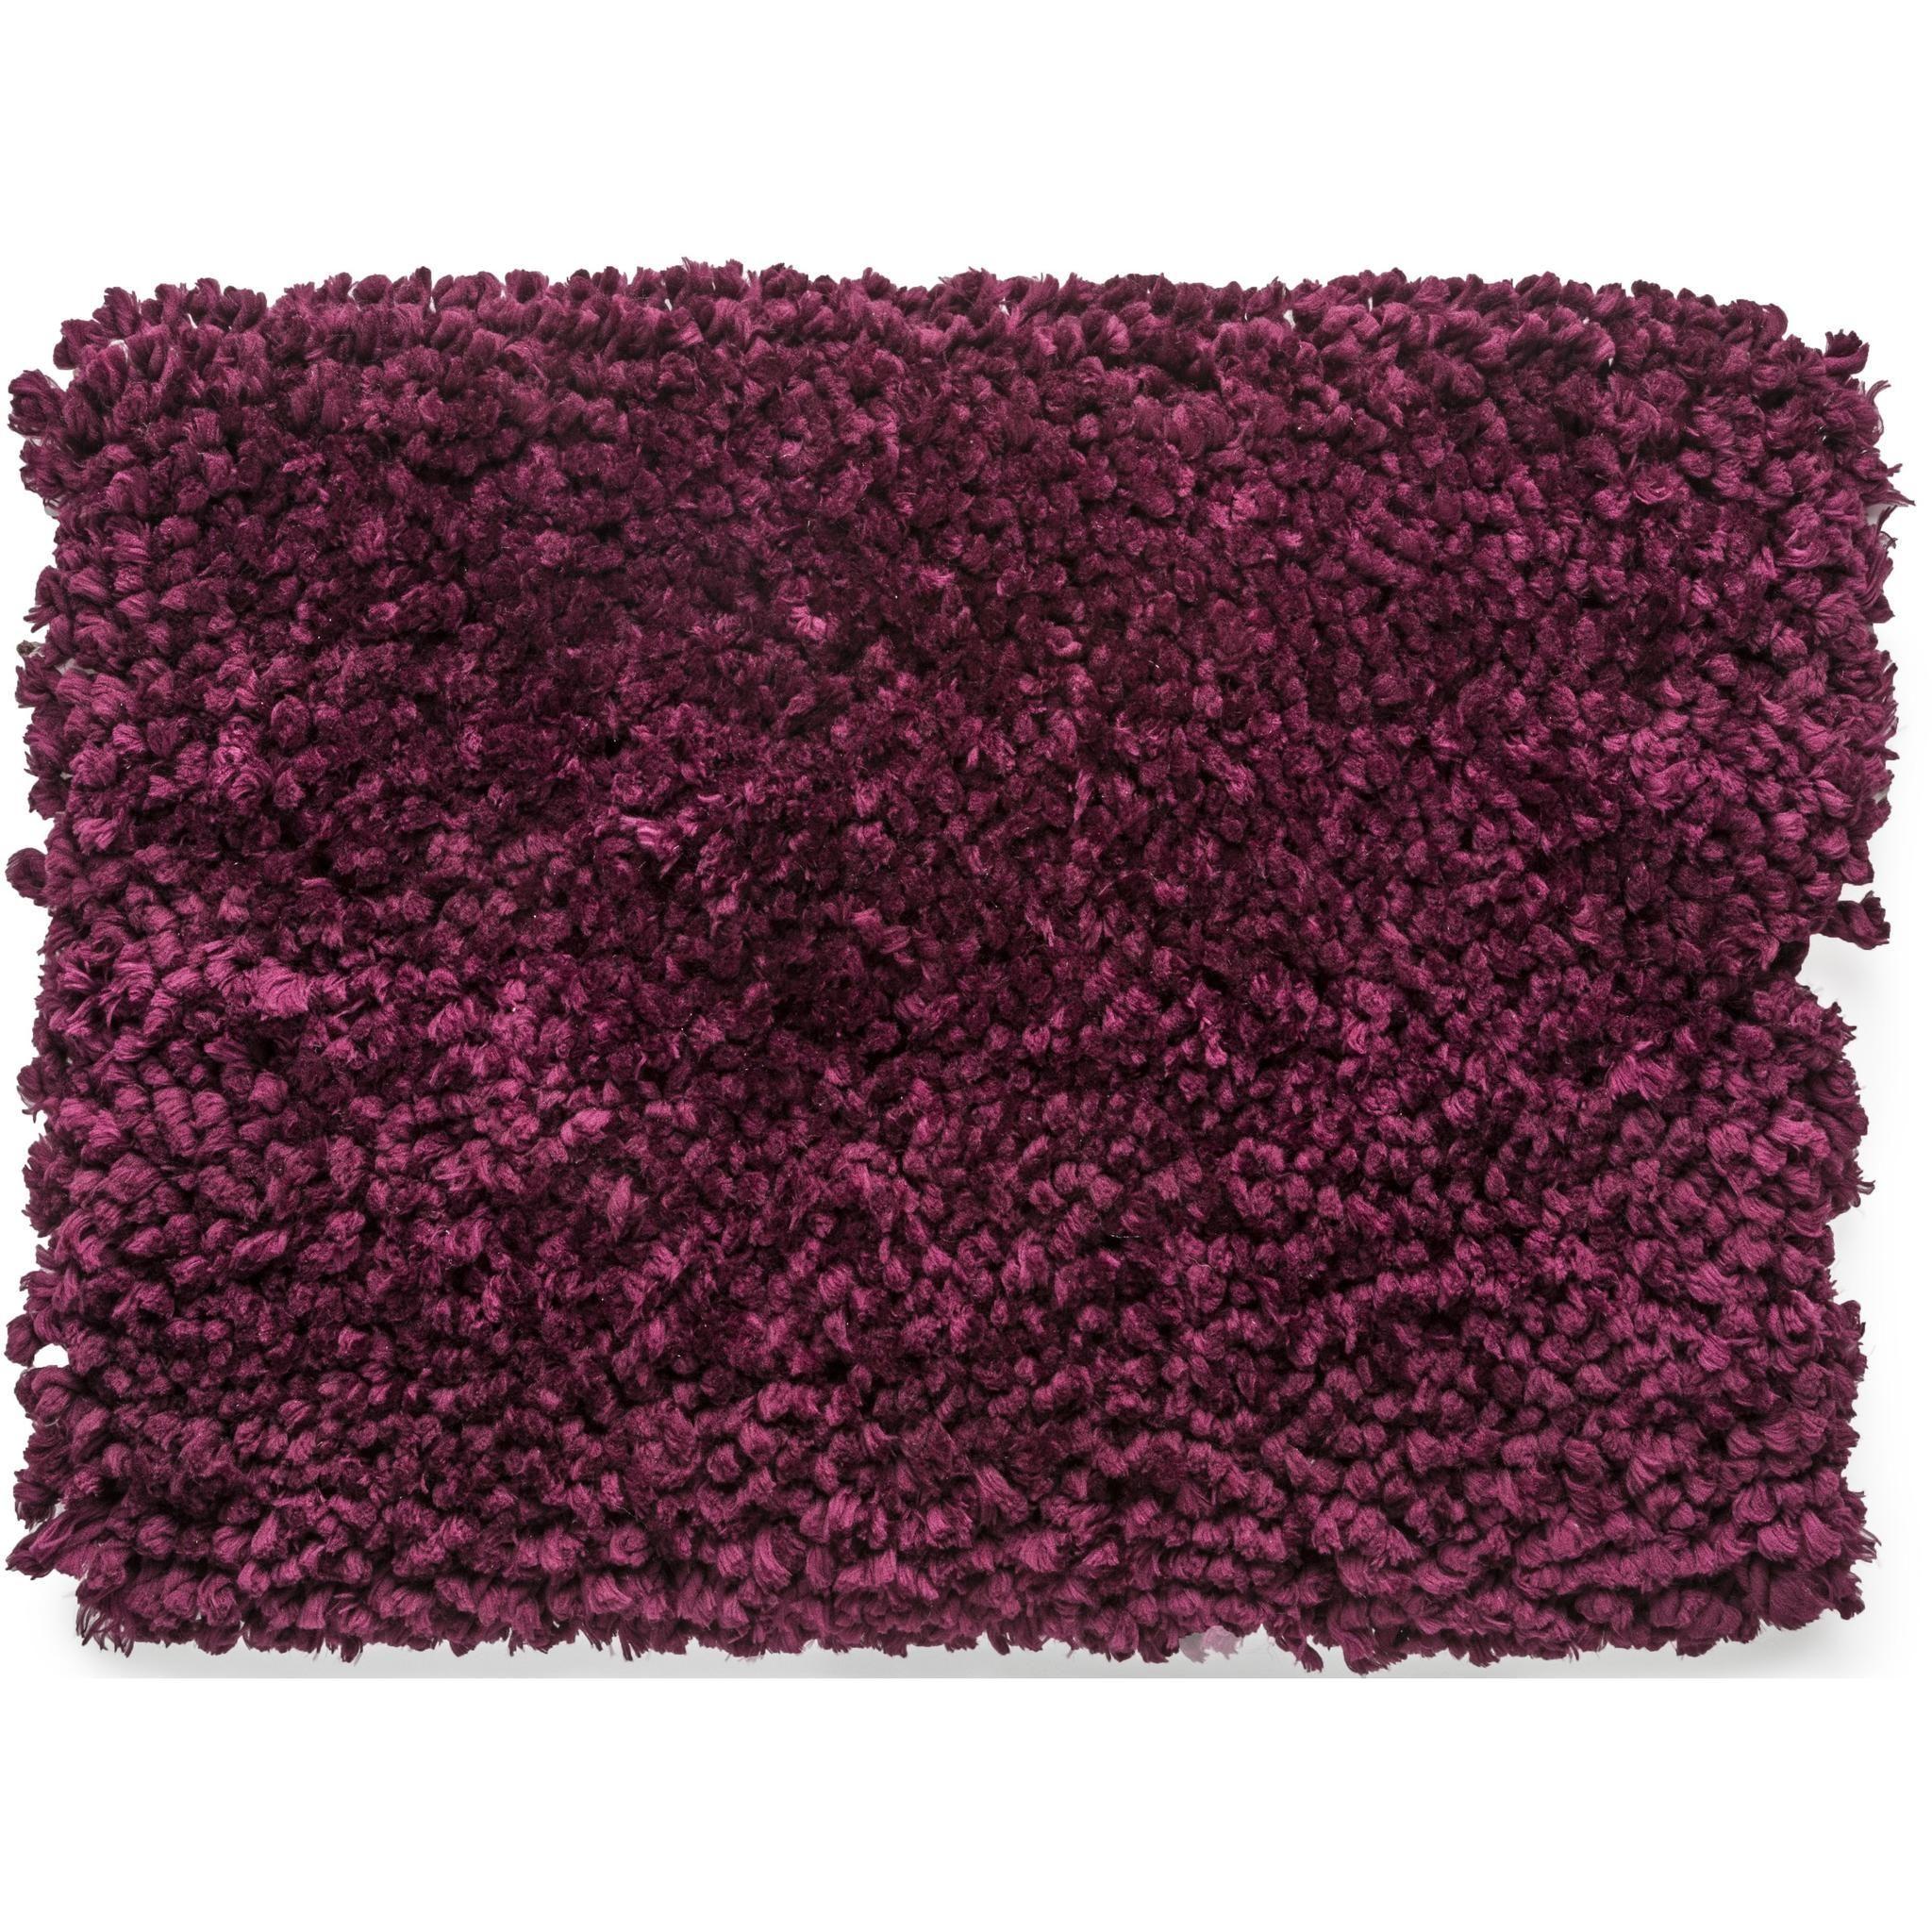 cp nuvola absorbent 100% cotton bath rug, washable, bath mat, 35.4